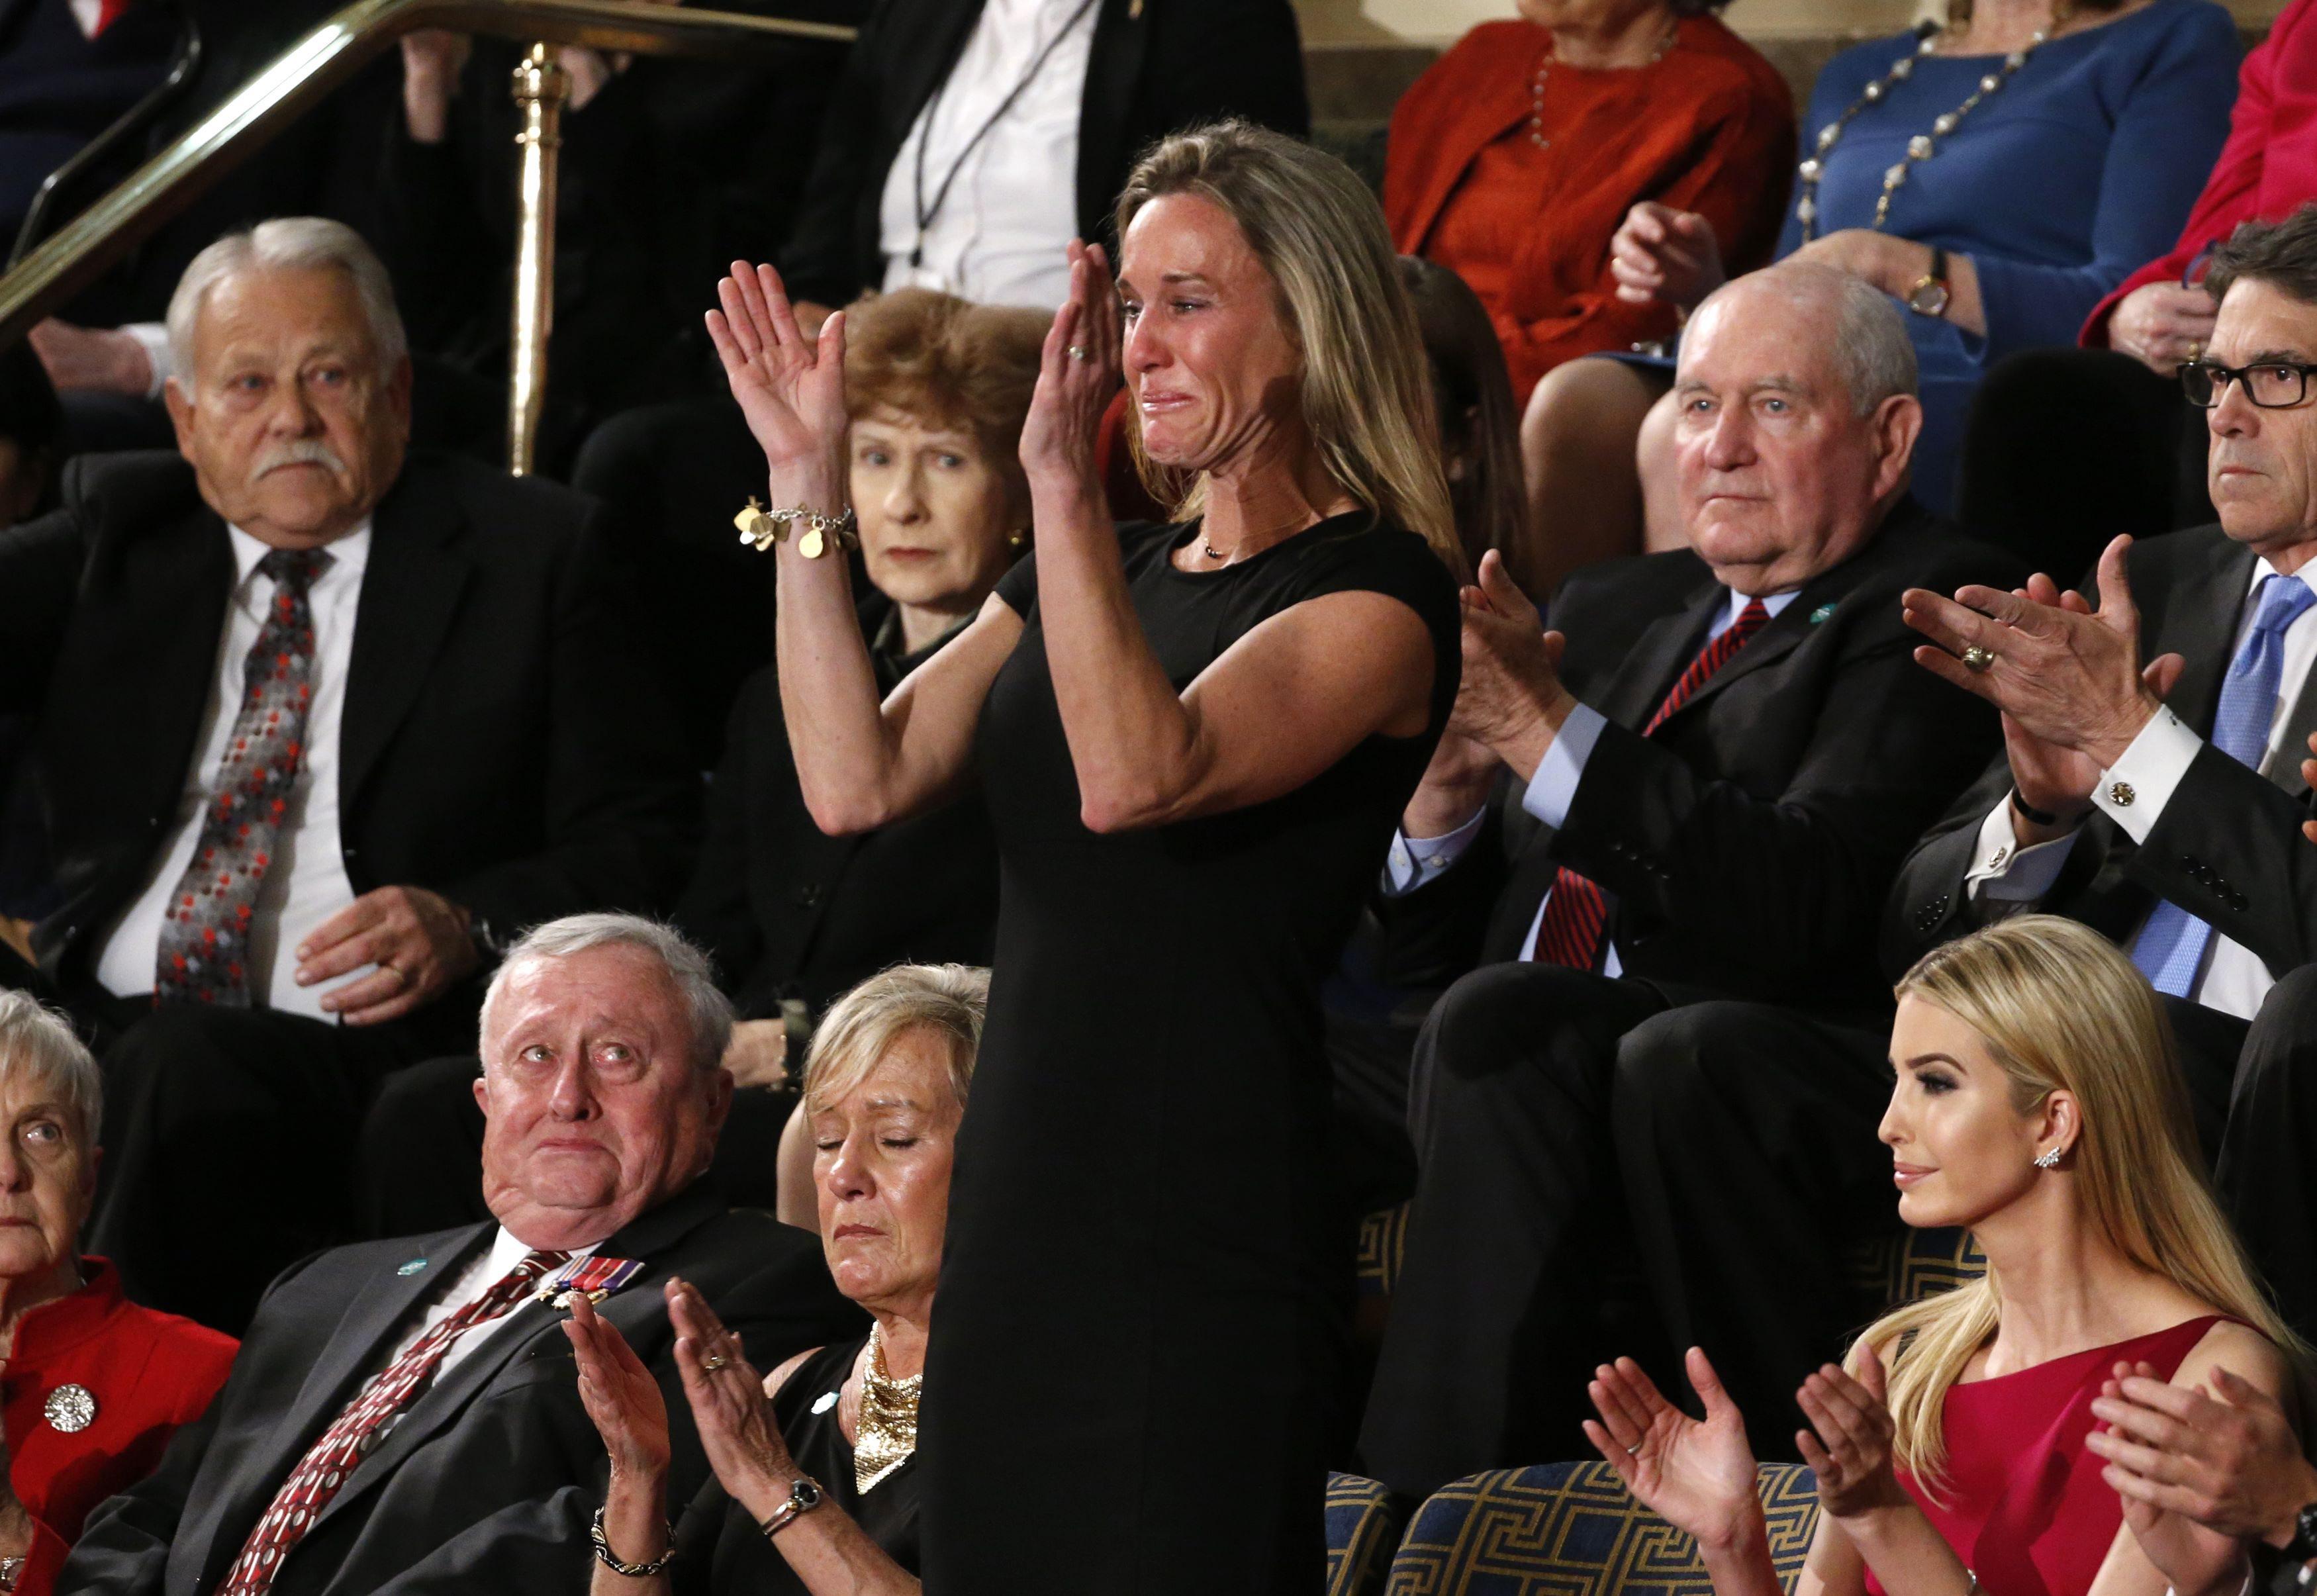 U.S. President Trump Addresses Joint Session of Congress - Washington, U.S. - 28/02/17 - Carryn Owens (C), widow of Senior Chief Petty Officer William